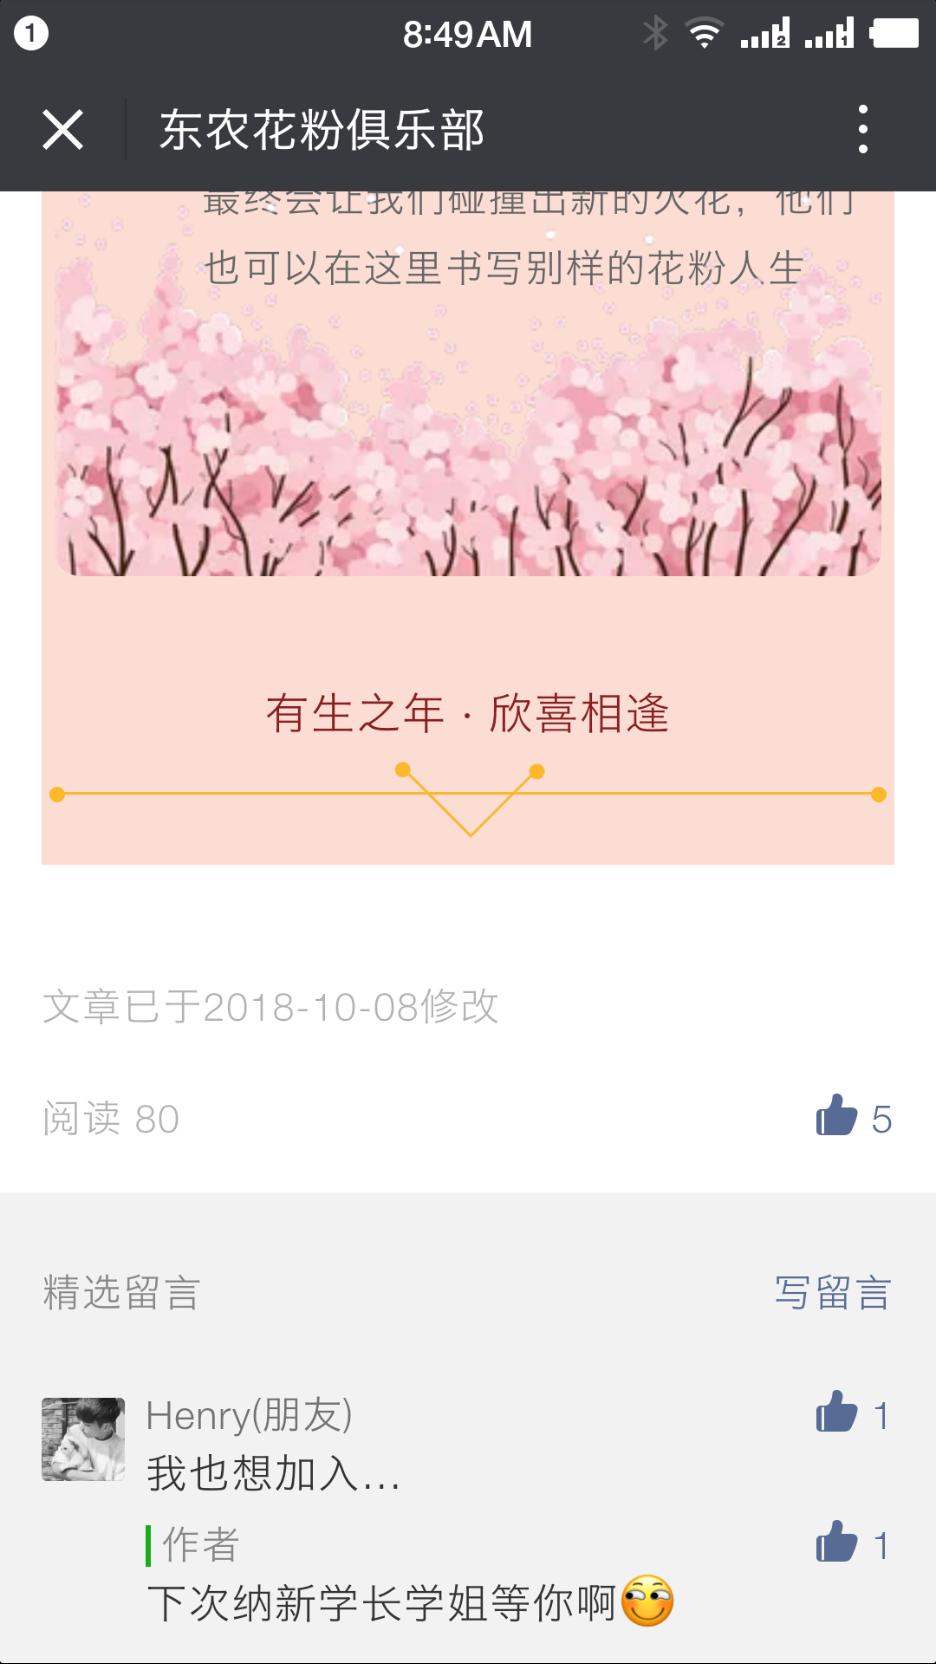 Screenshot_2019-02-07-08-49-12-999_WeChat.png